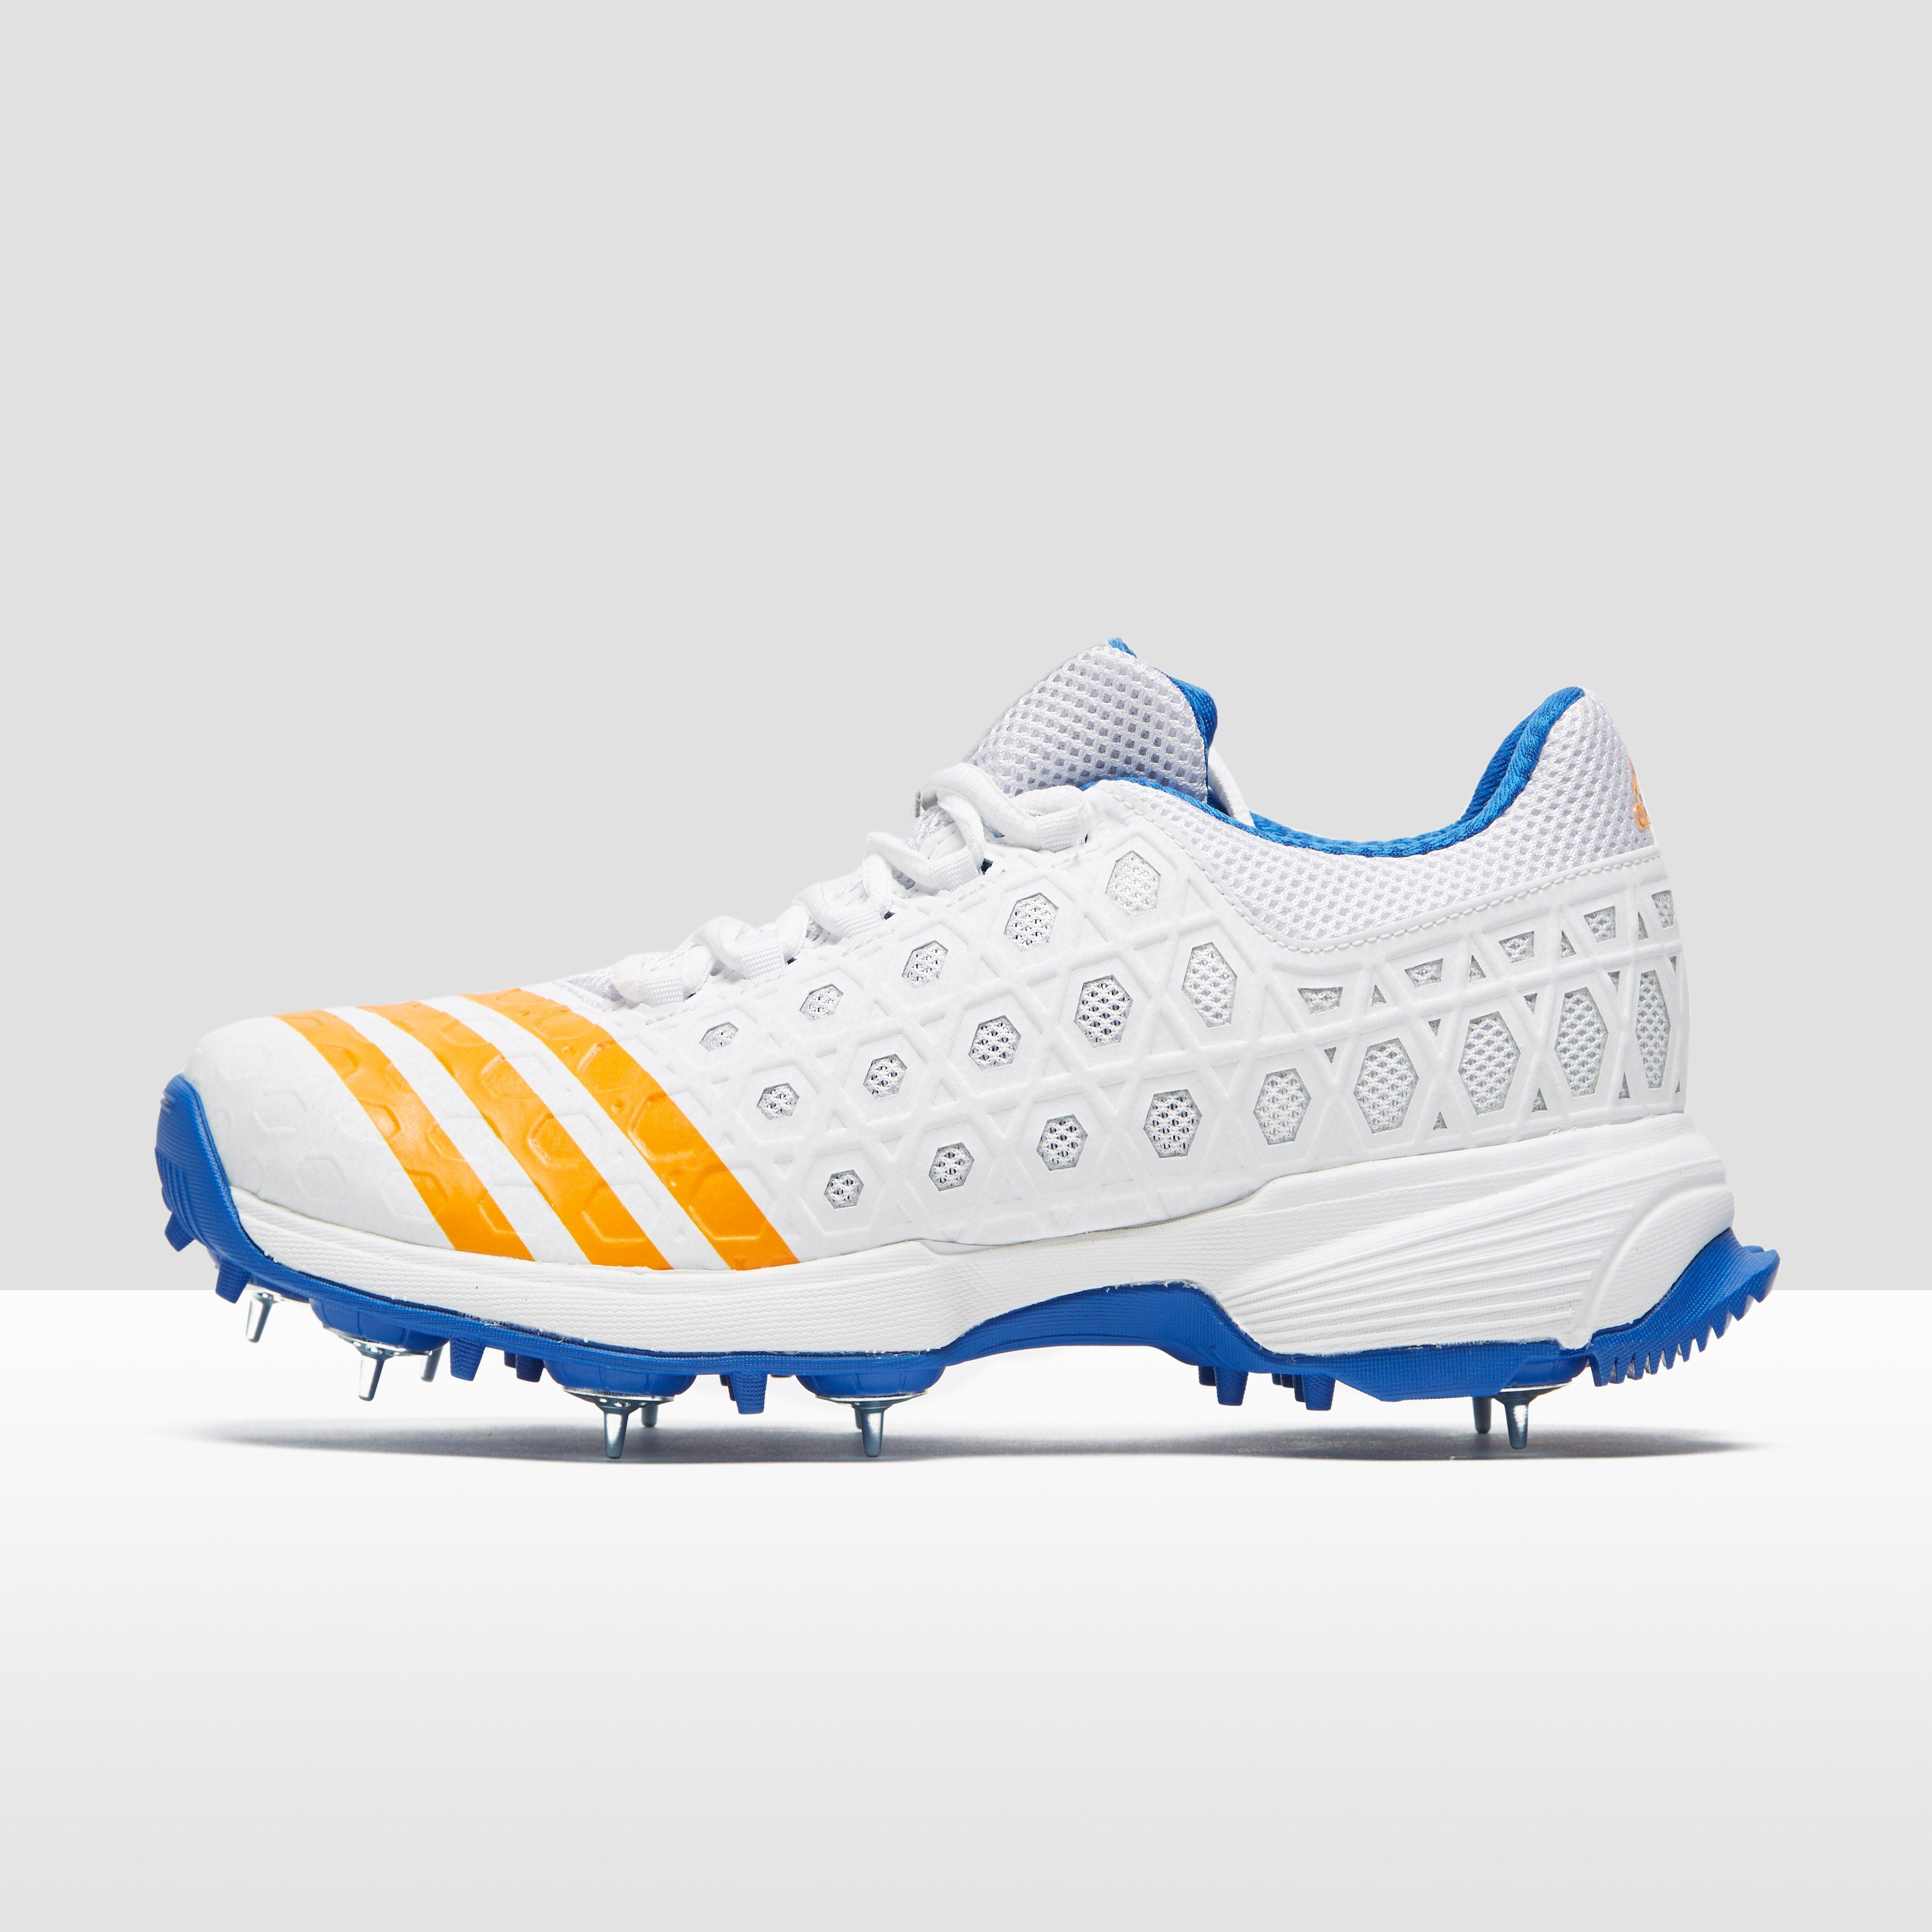 adidas Men's SL22 Full Spike II Cricket Shoes White